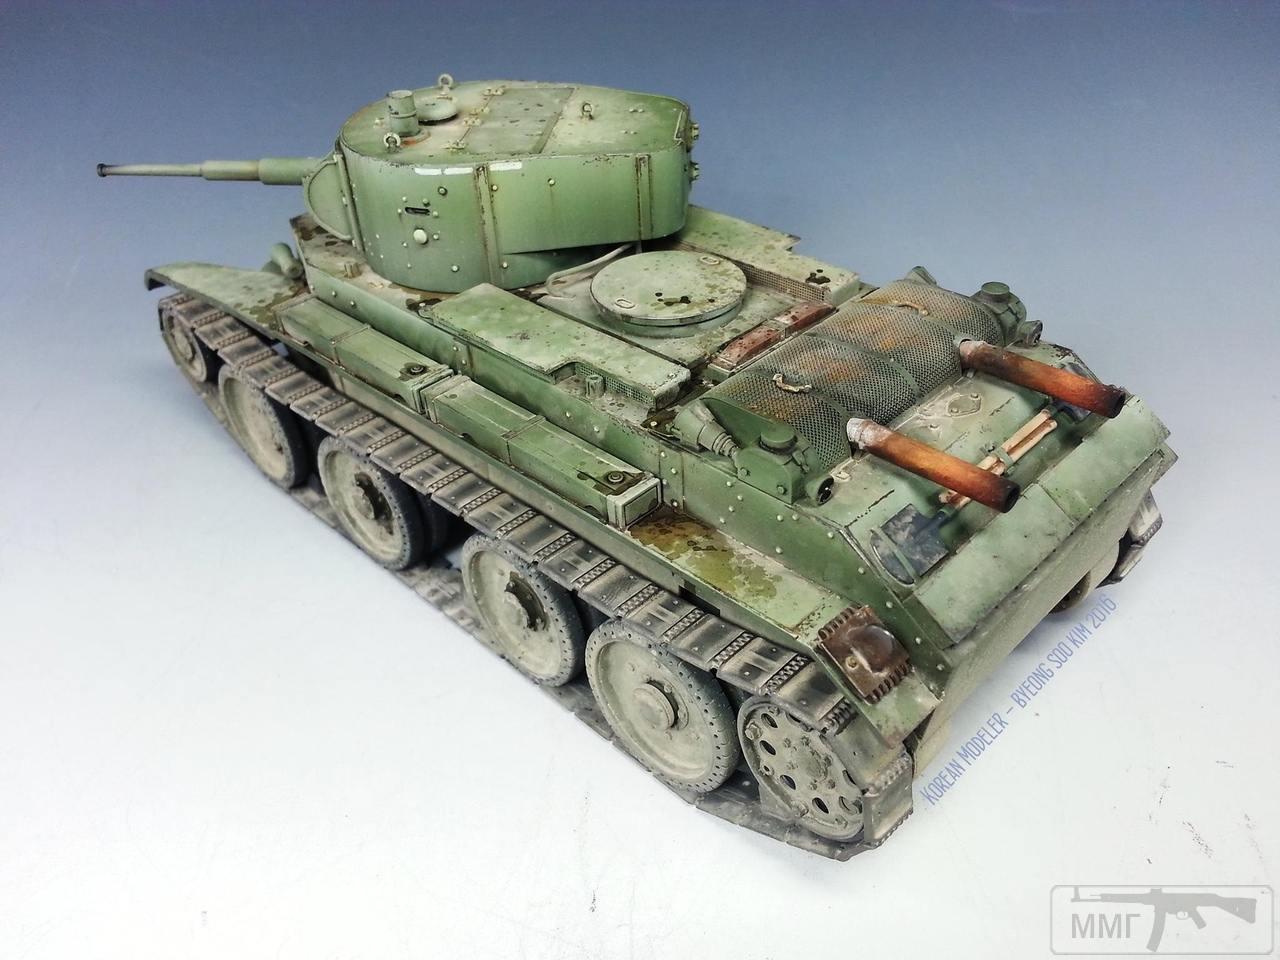 37977 - Модели бронетехники